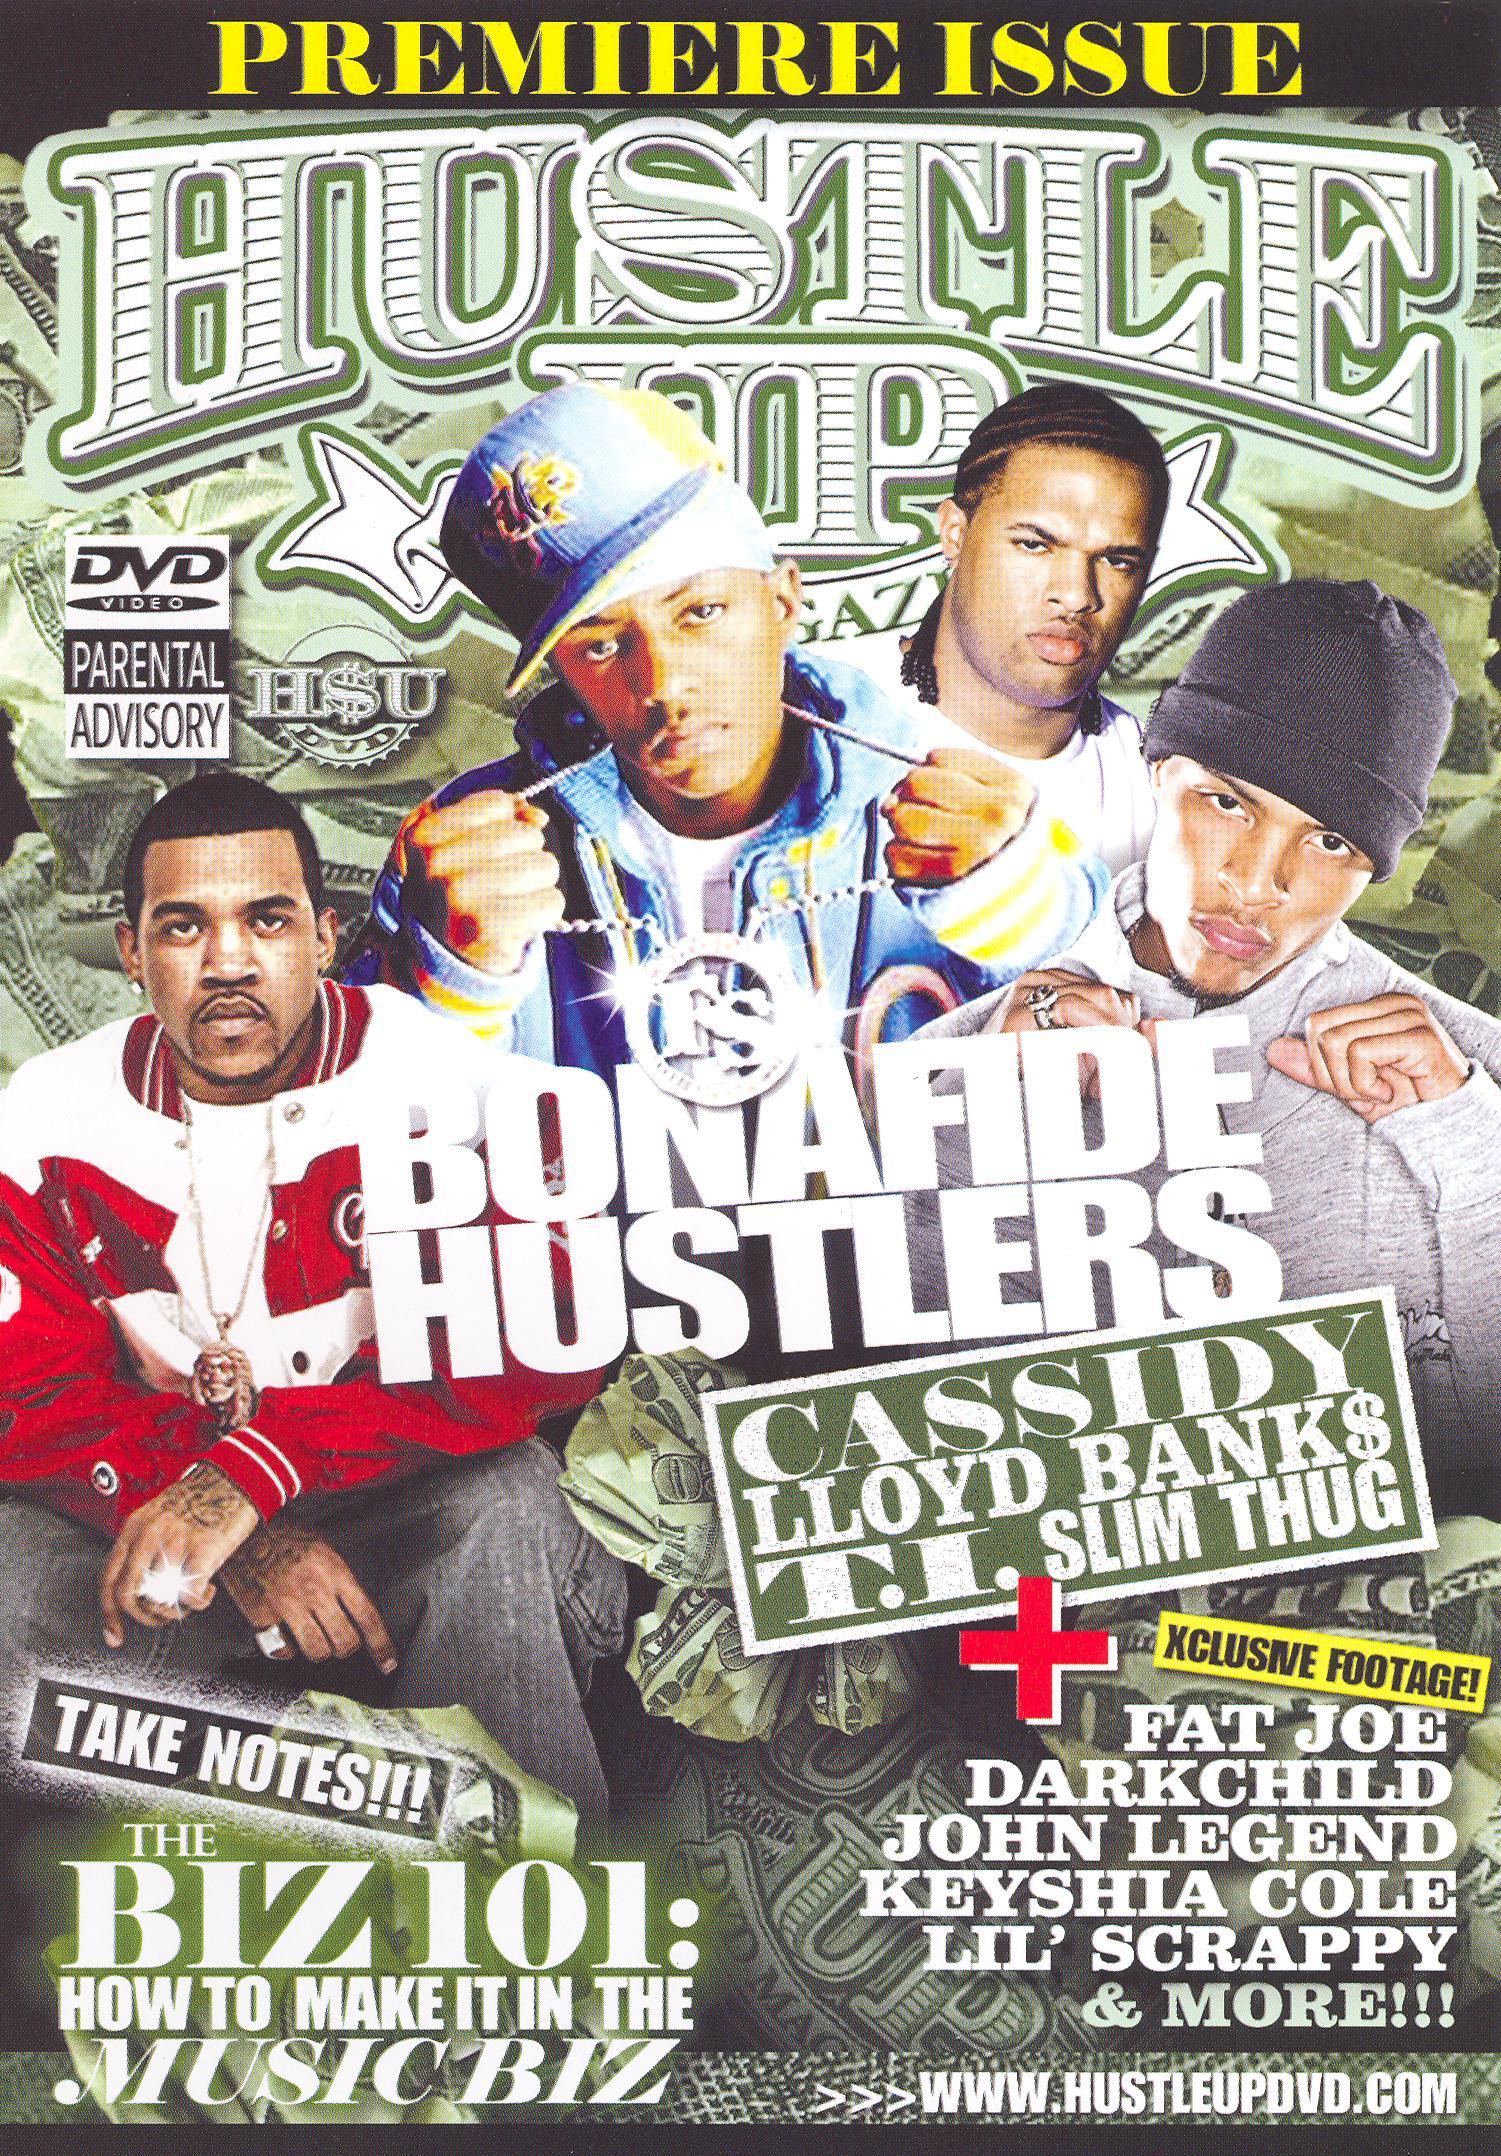 Hustle Up DVD Magazine, Vol. 1